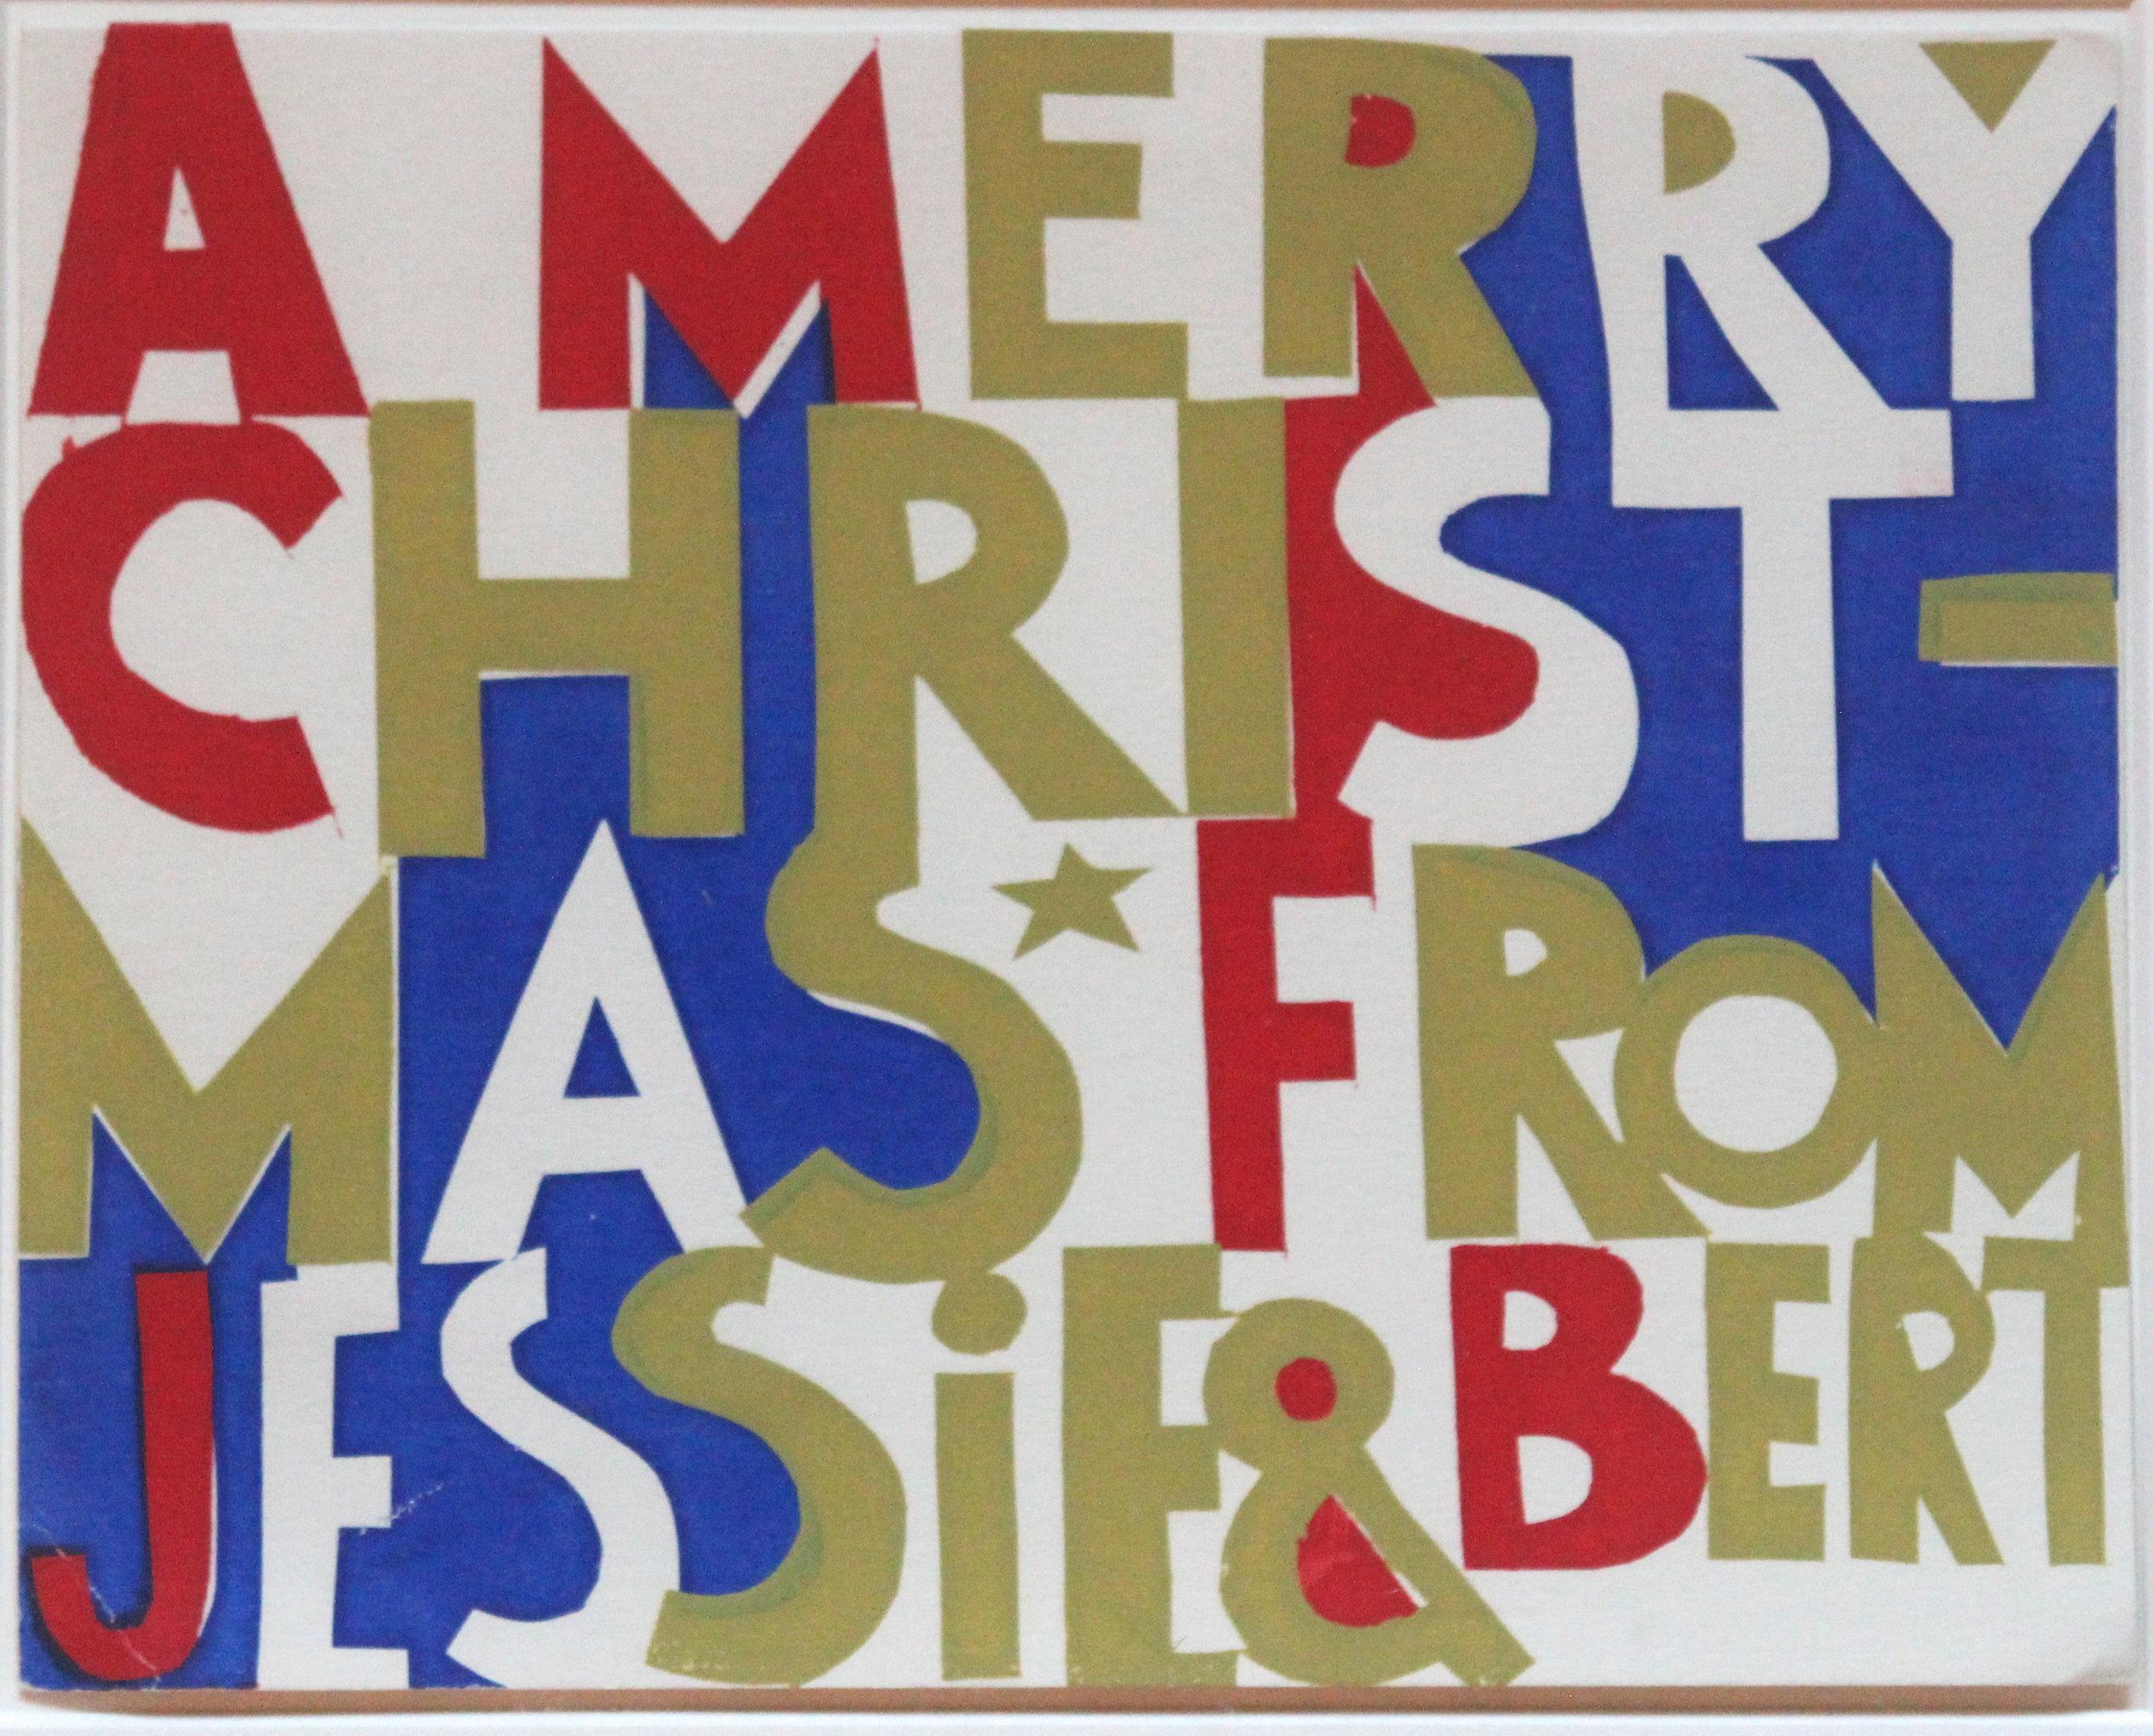 B.C. Binning, Merry Christmas From Jesse & Bert, Christmas Card